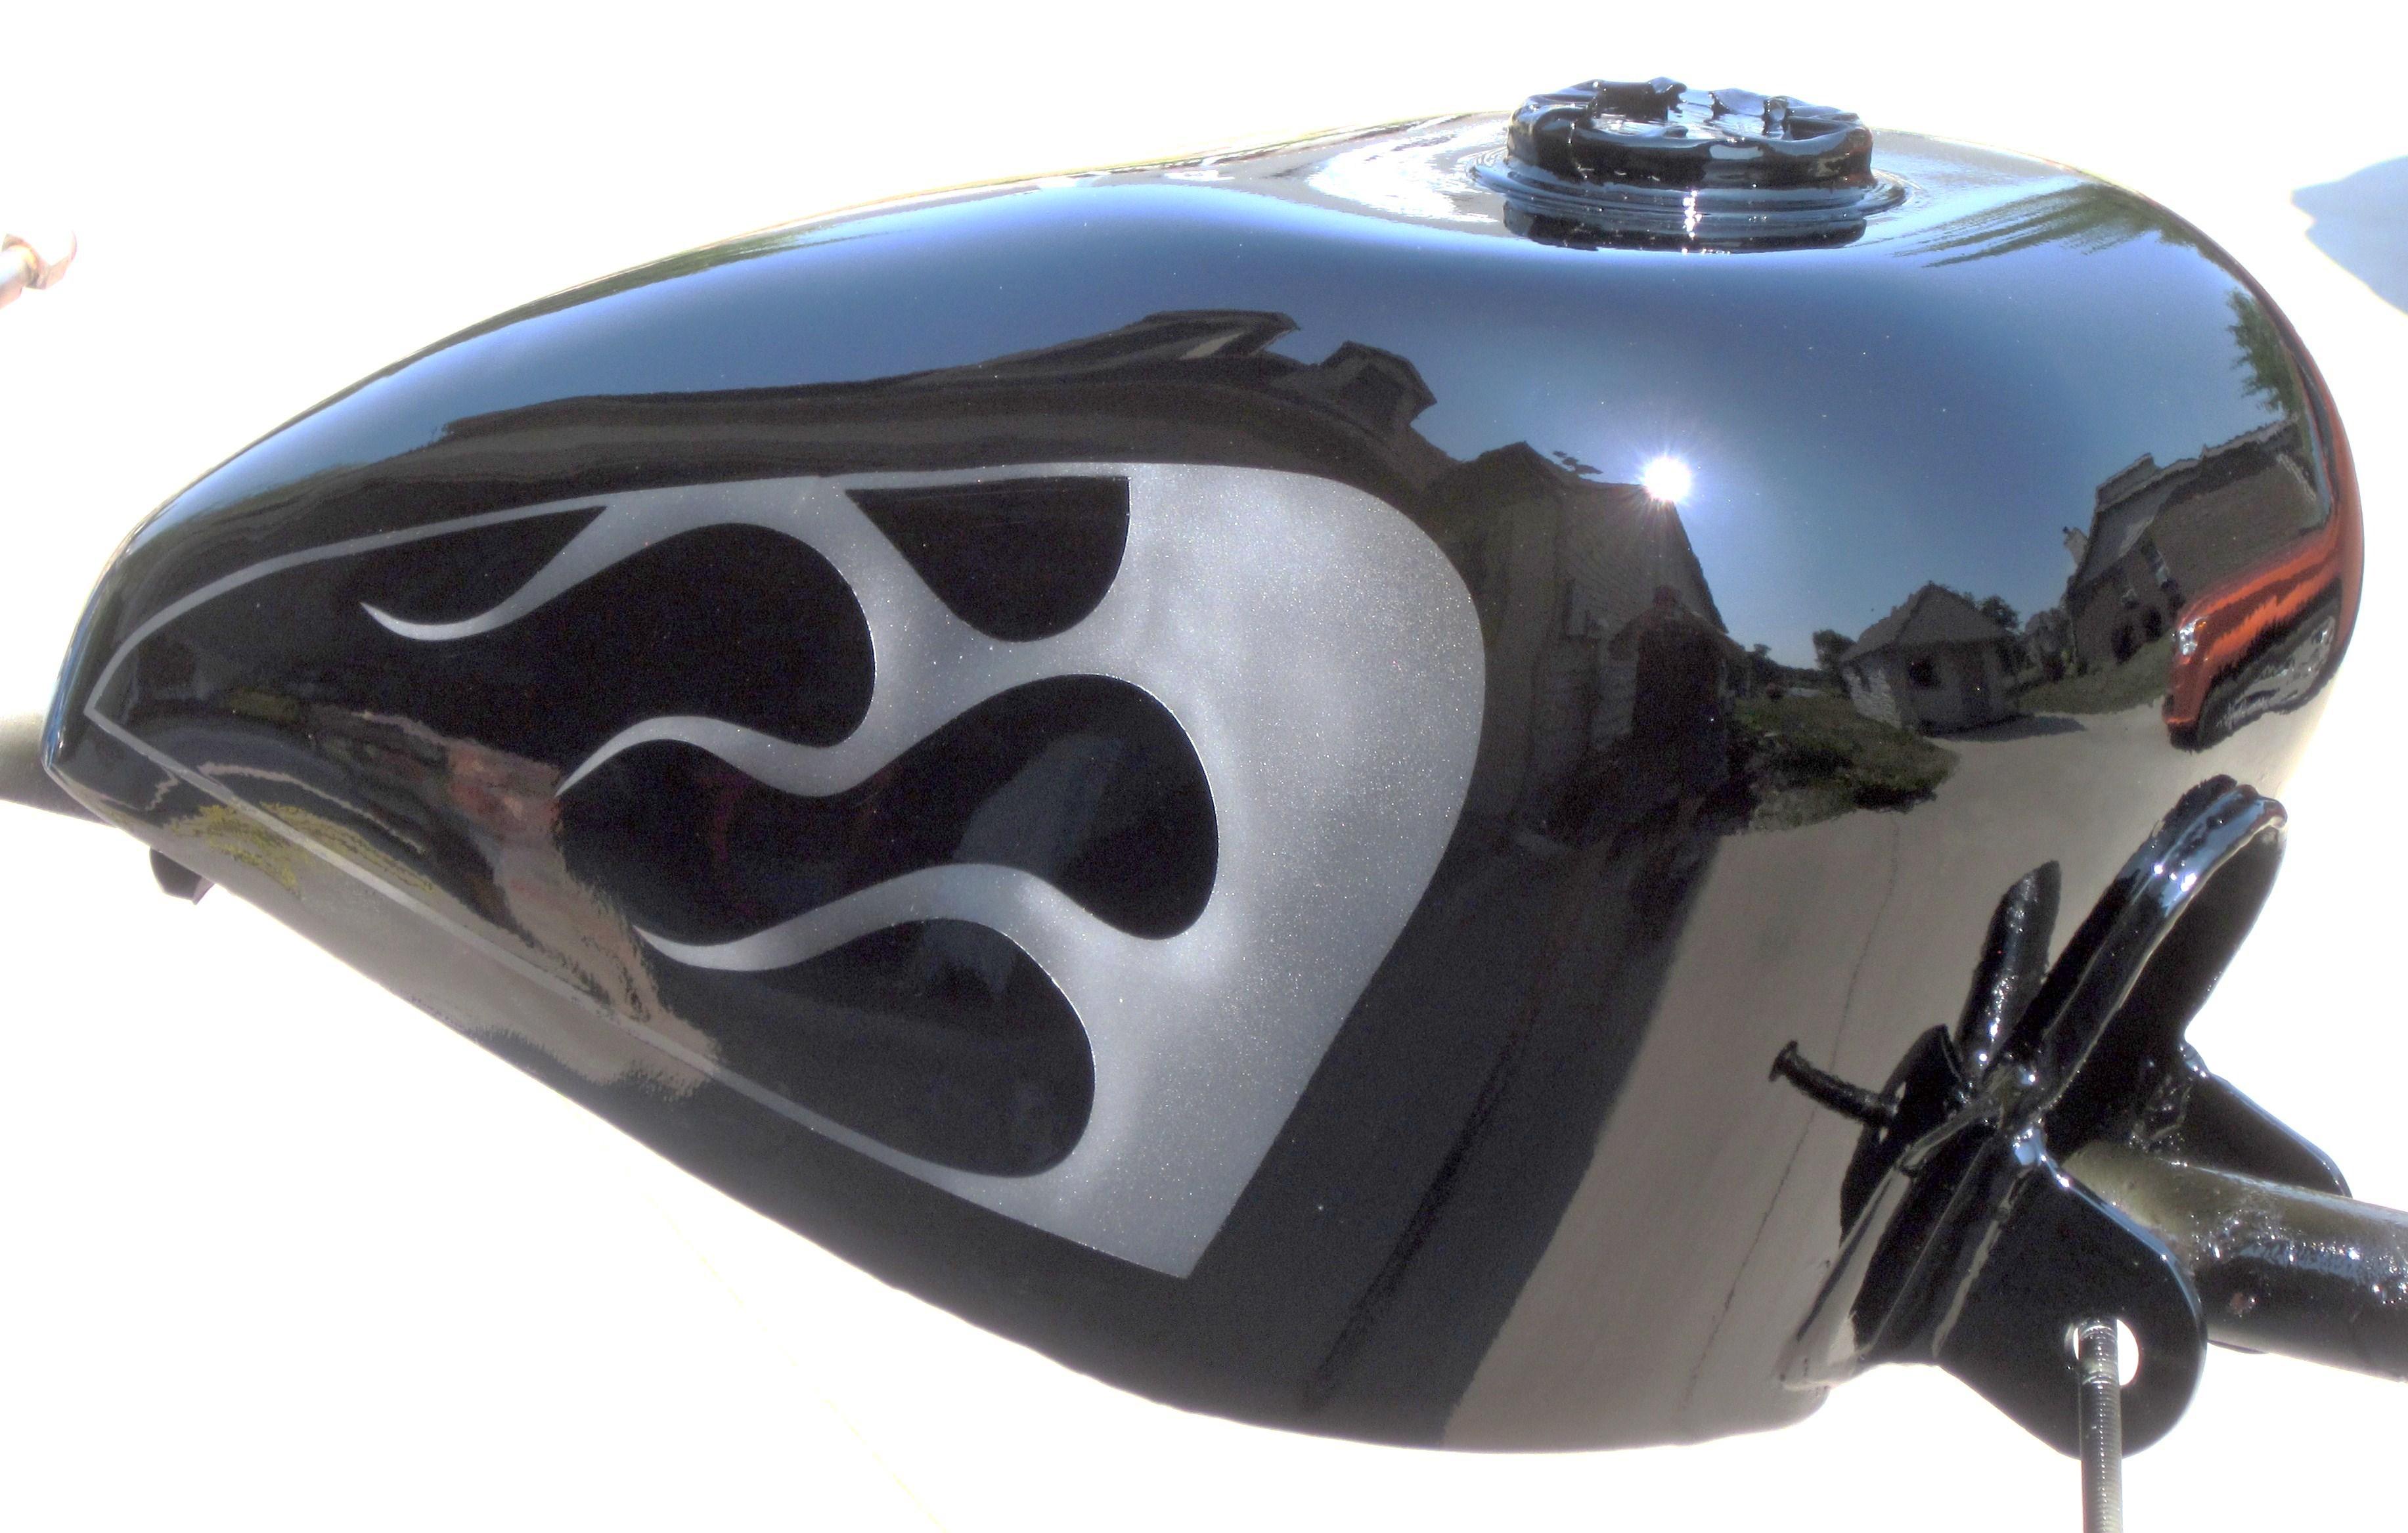 Click image for larger version  Name:bike, tank, paint gun 015.JPG Views:4885 Size:1.05 MB ID:66332